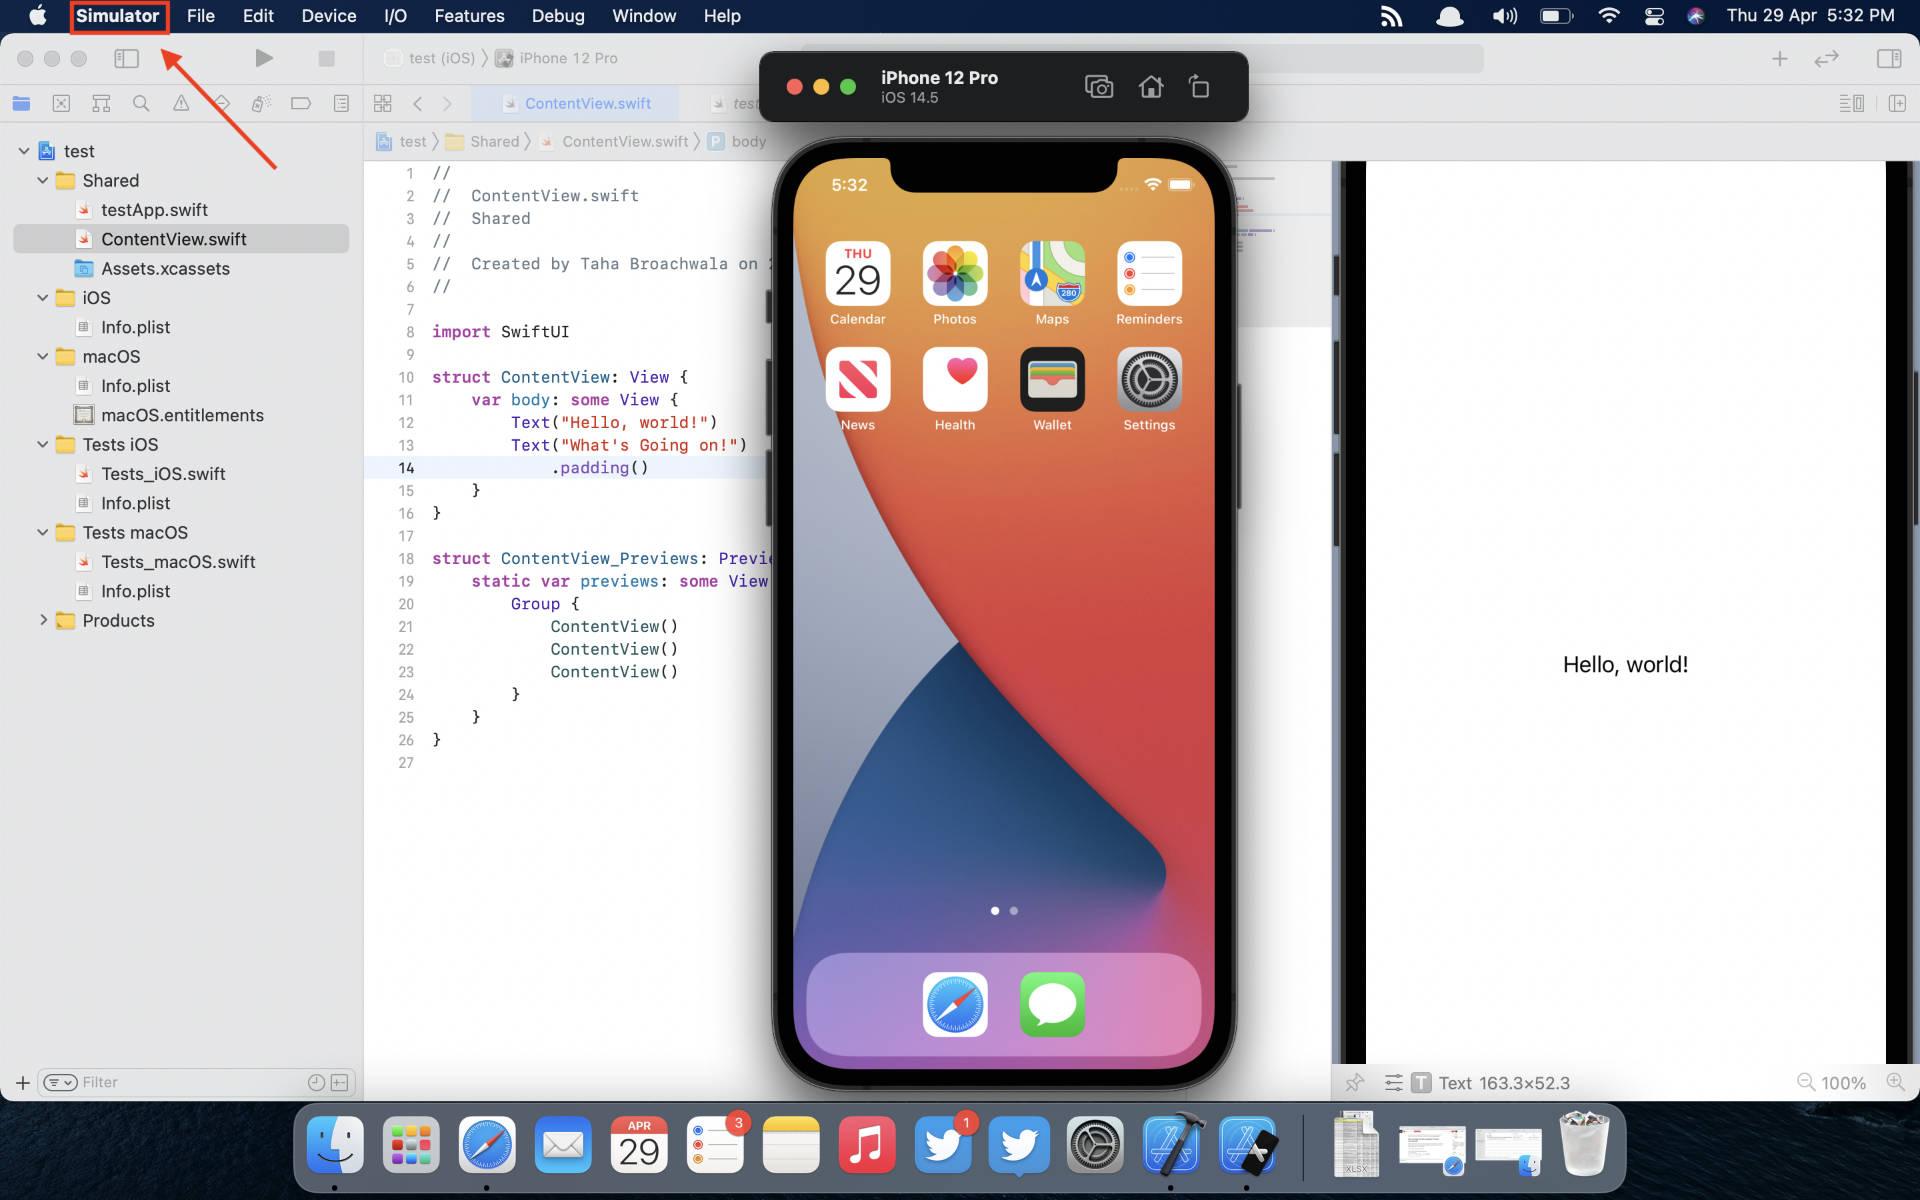 Simulator Preferences Xcode Screen Recording